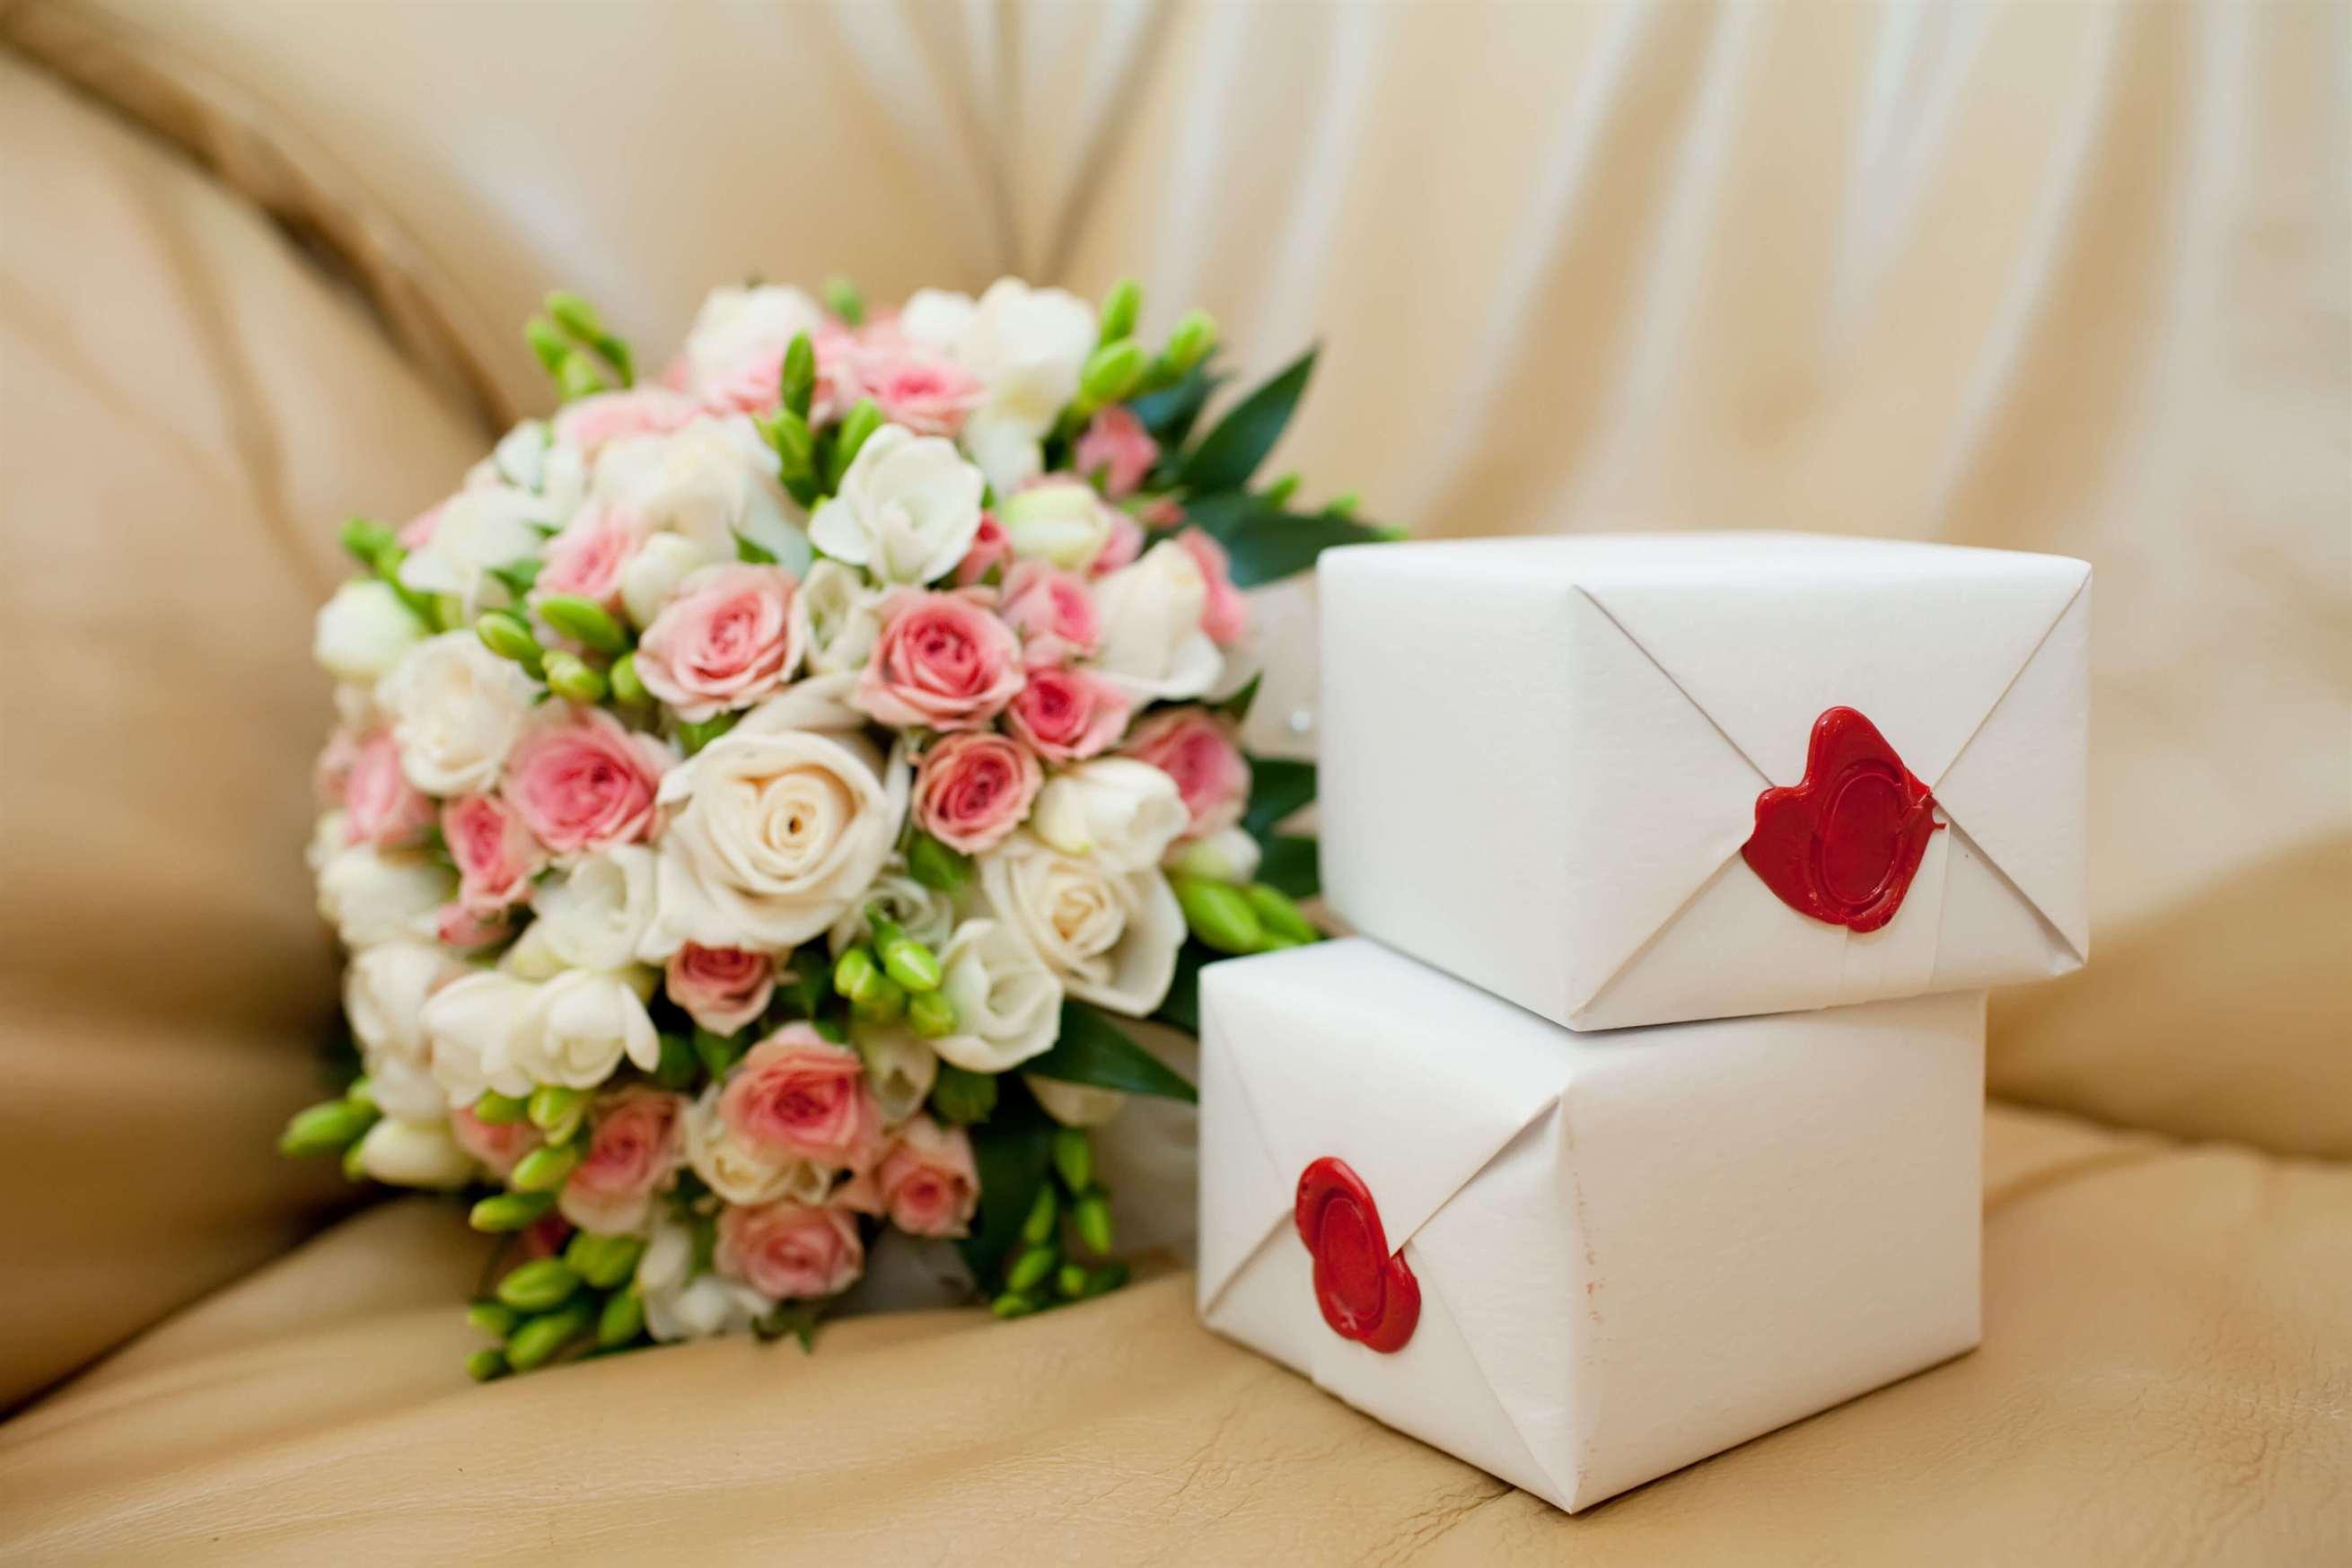 Картинка подарок на свадьбу